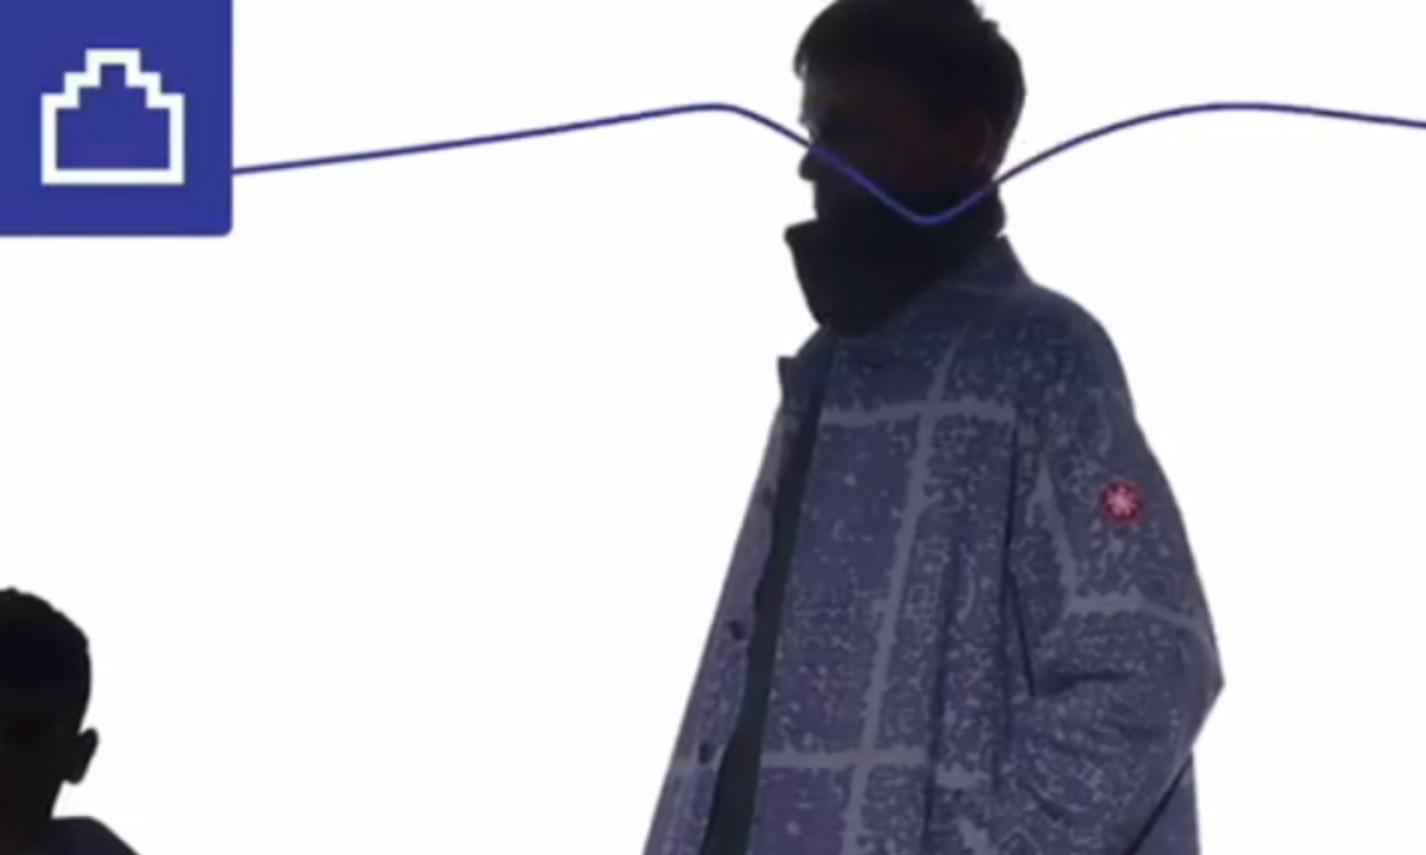 Cav Empt 2019 秋冬系列预告视频释出